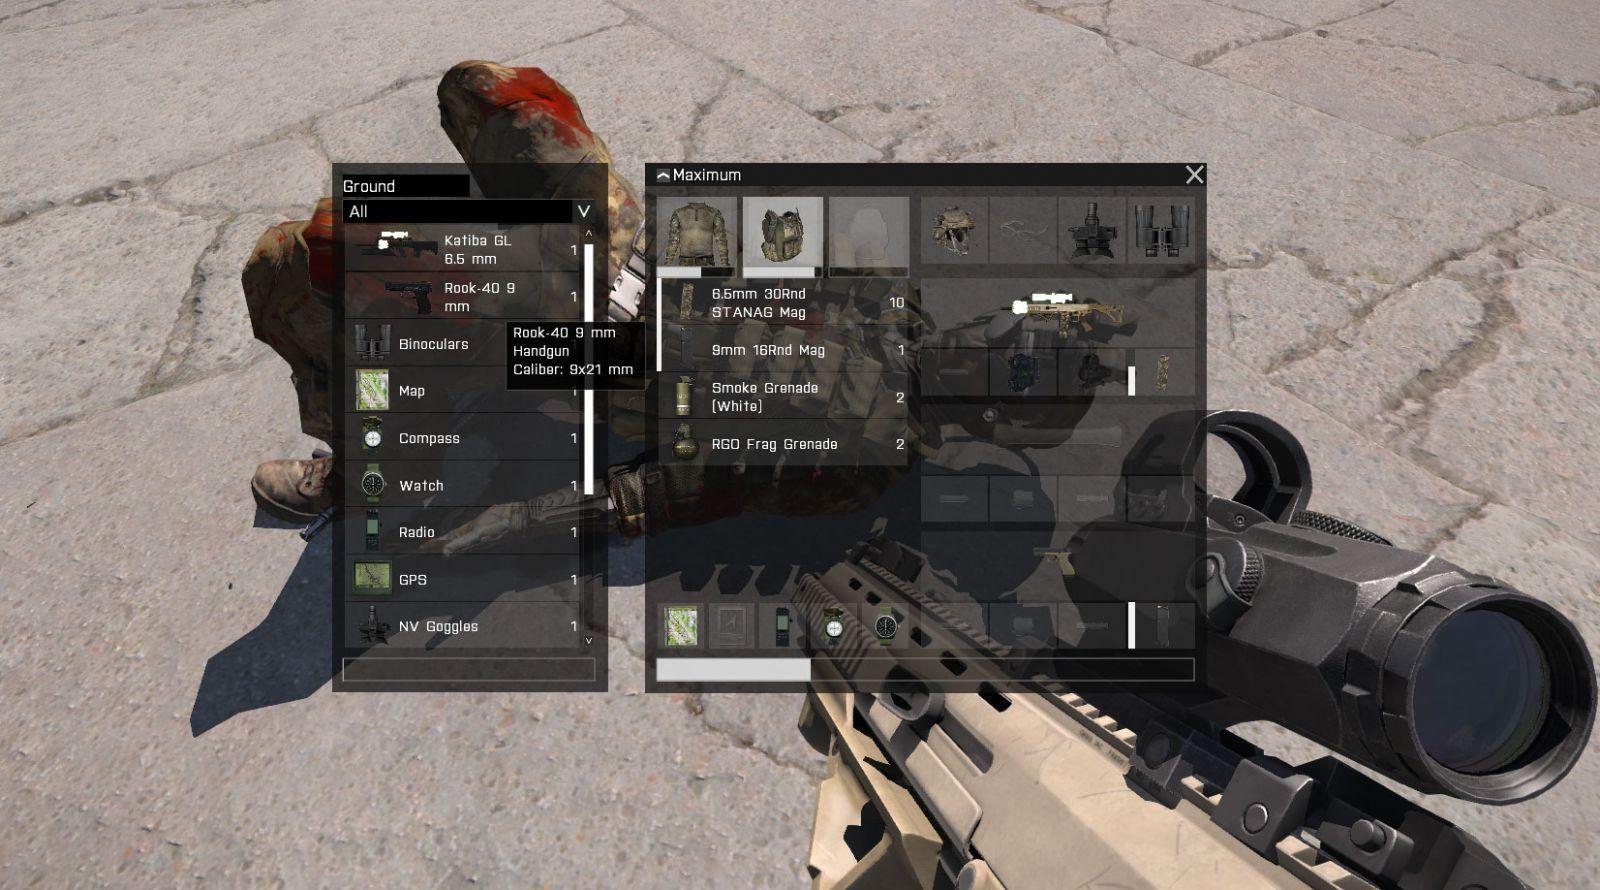 arma 3 inventory 4